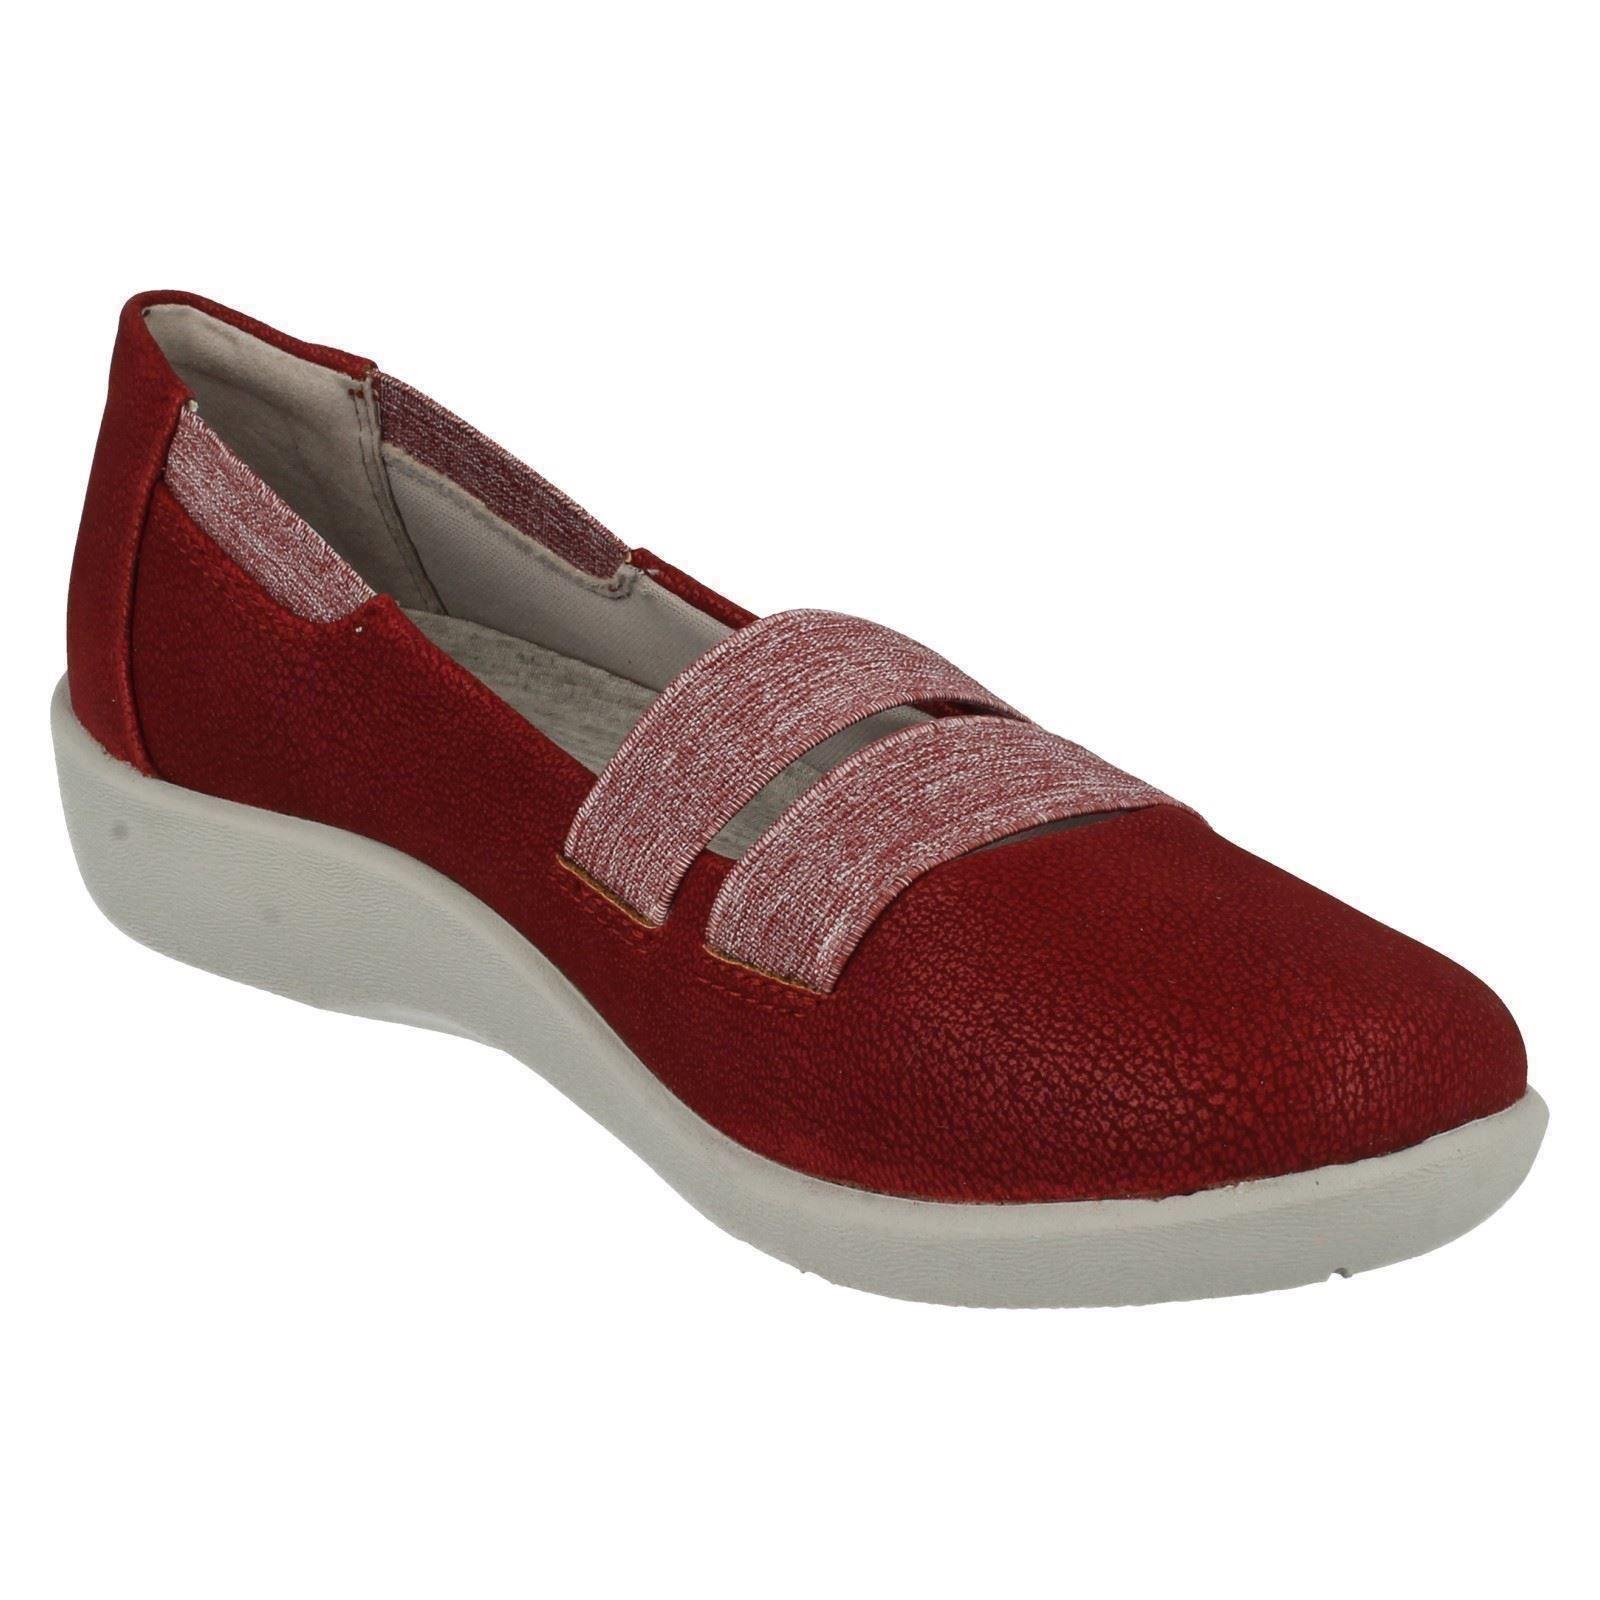 Sillian Rest Cherry Shoes Clarks